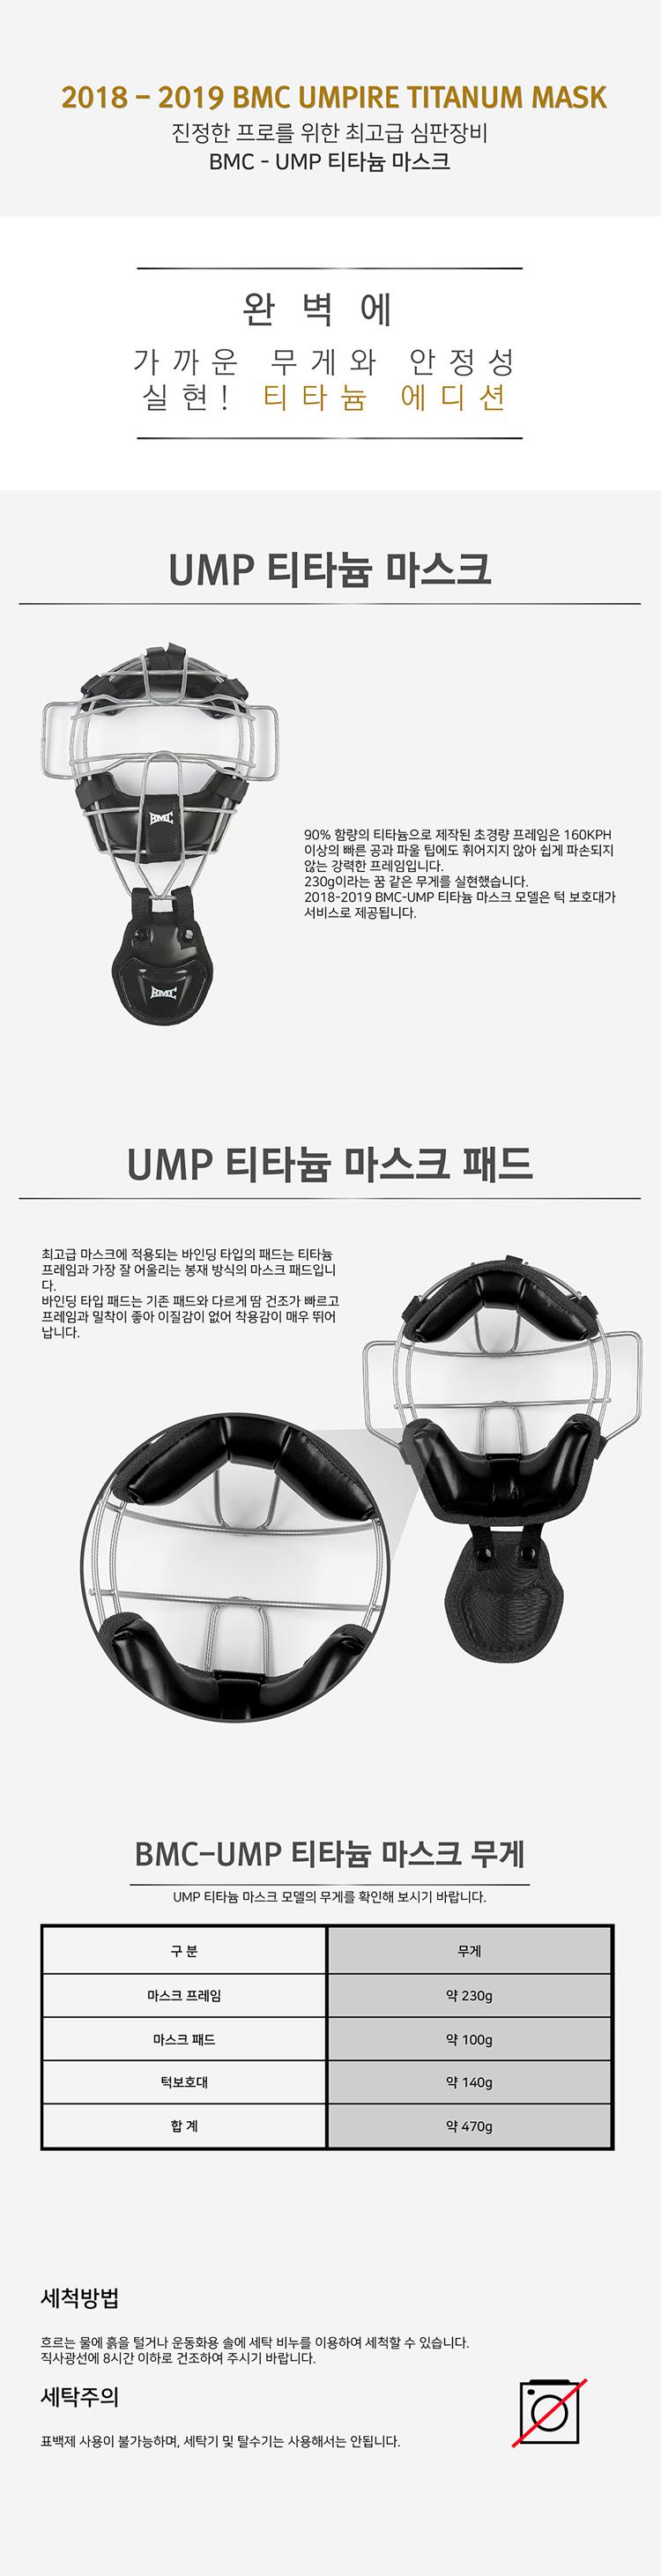 UMP-MASK.jpg